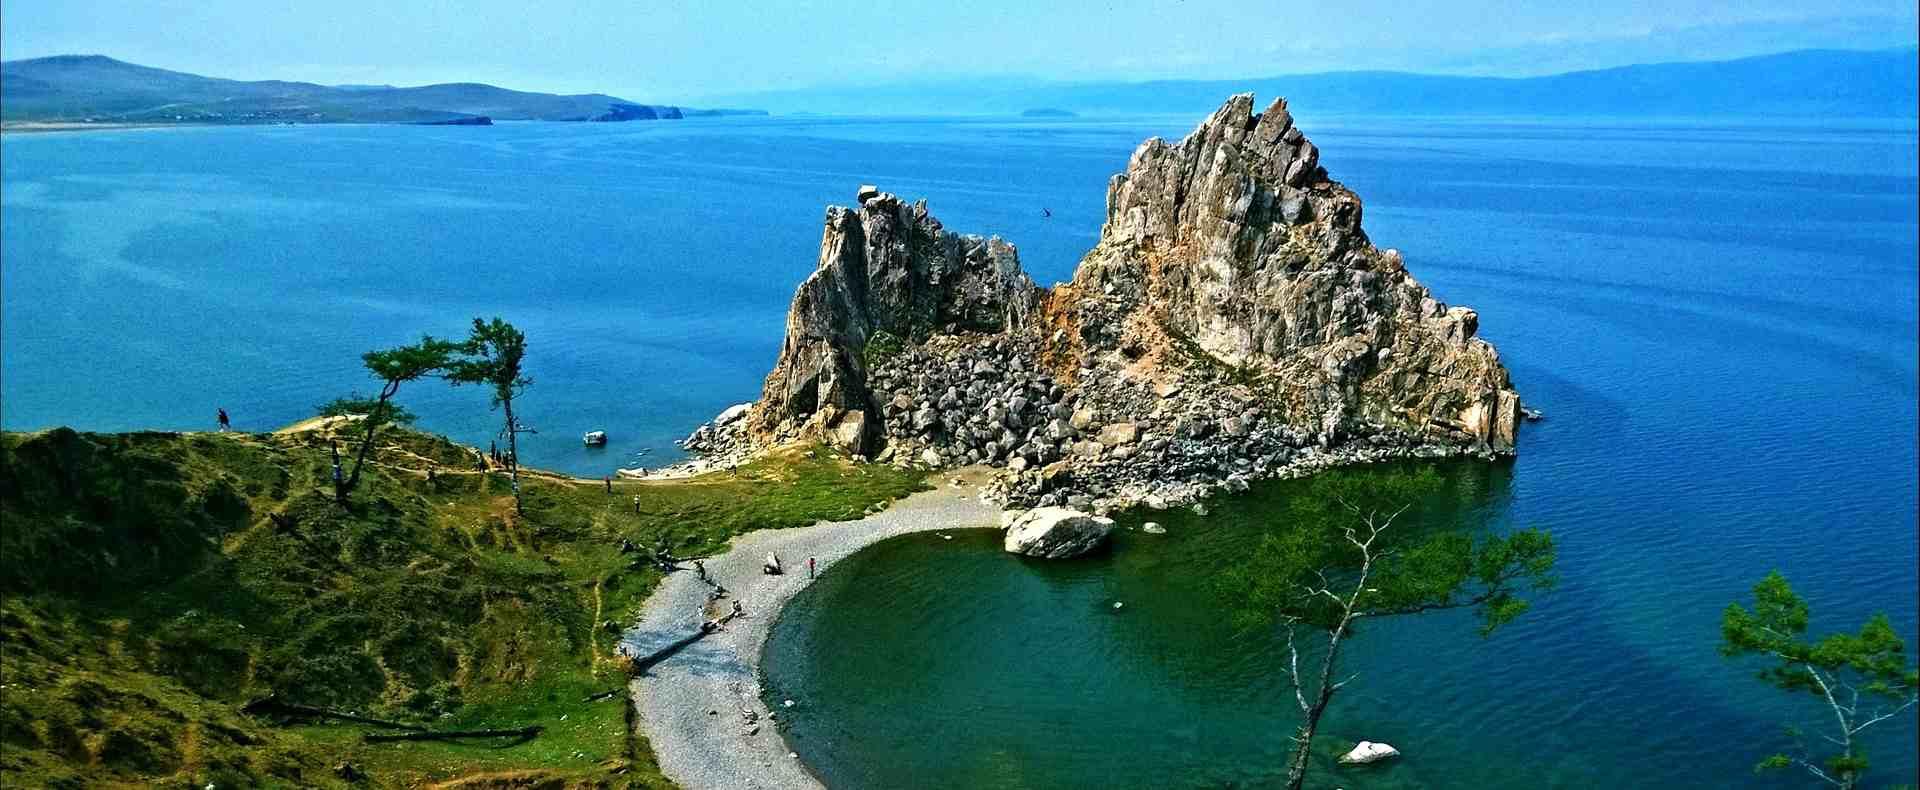 Private tour from Moscow to Irkutsk & Lake Baikal